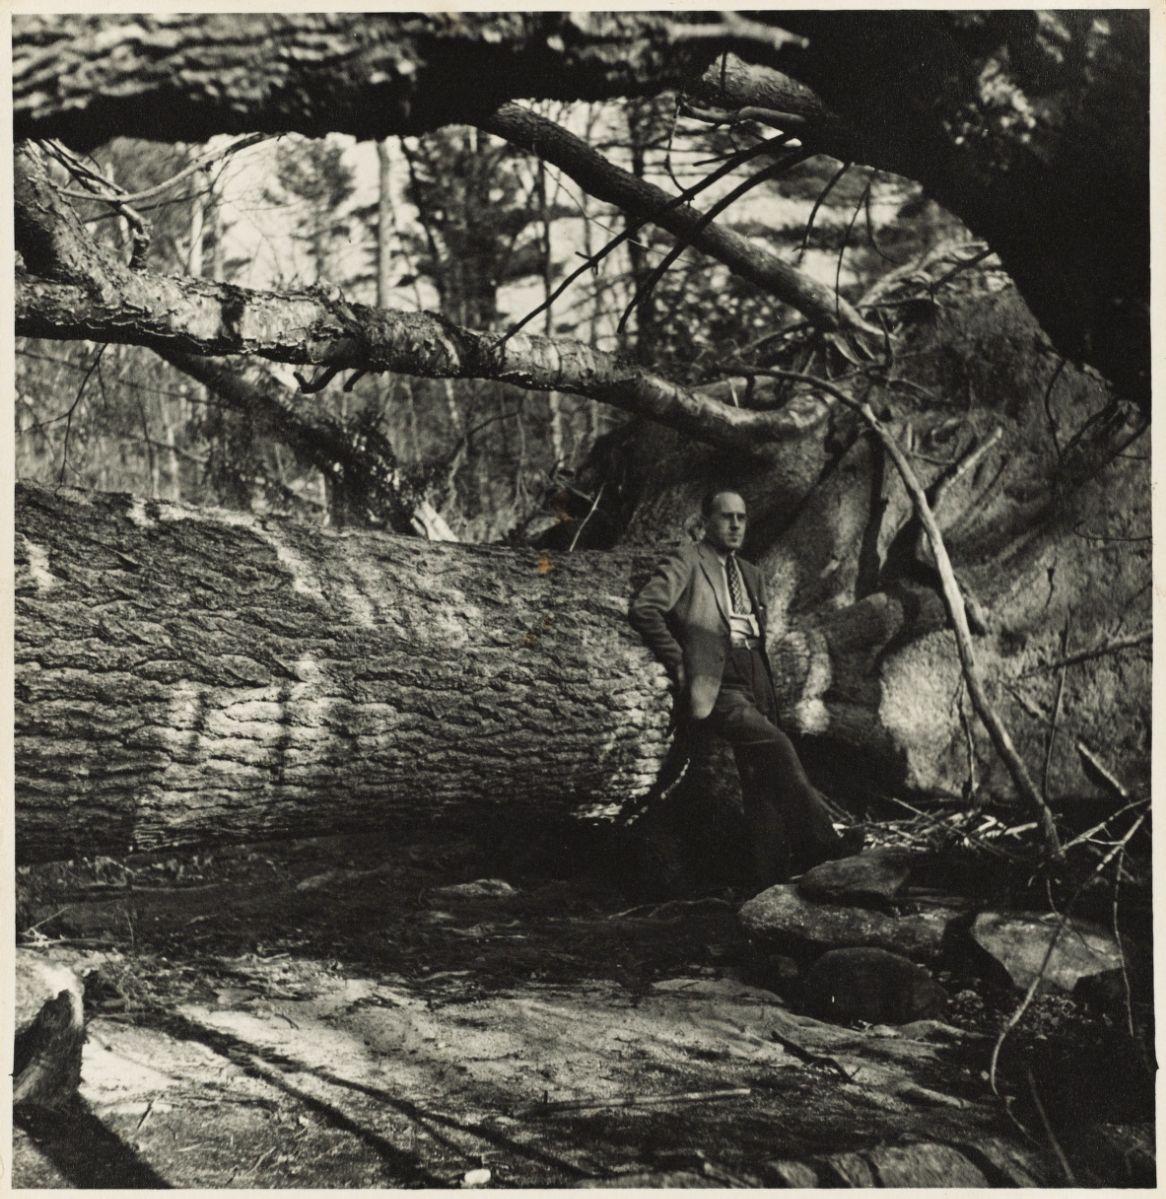 Al Cline standing near downed tree